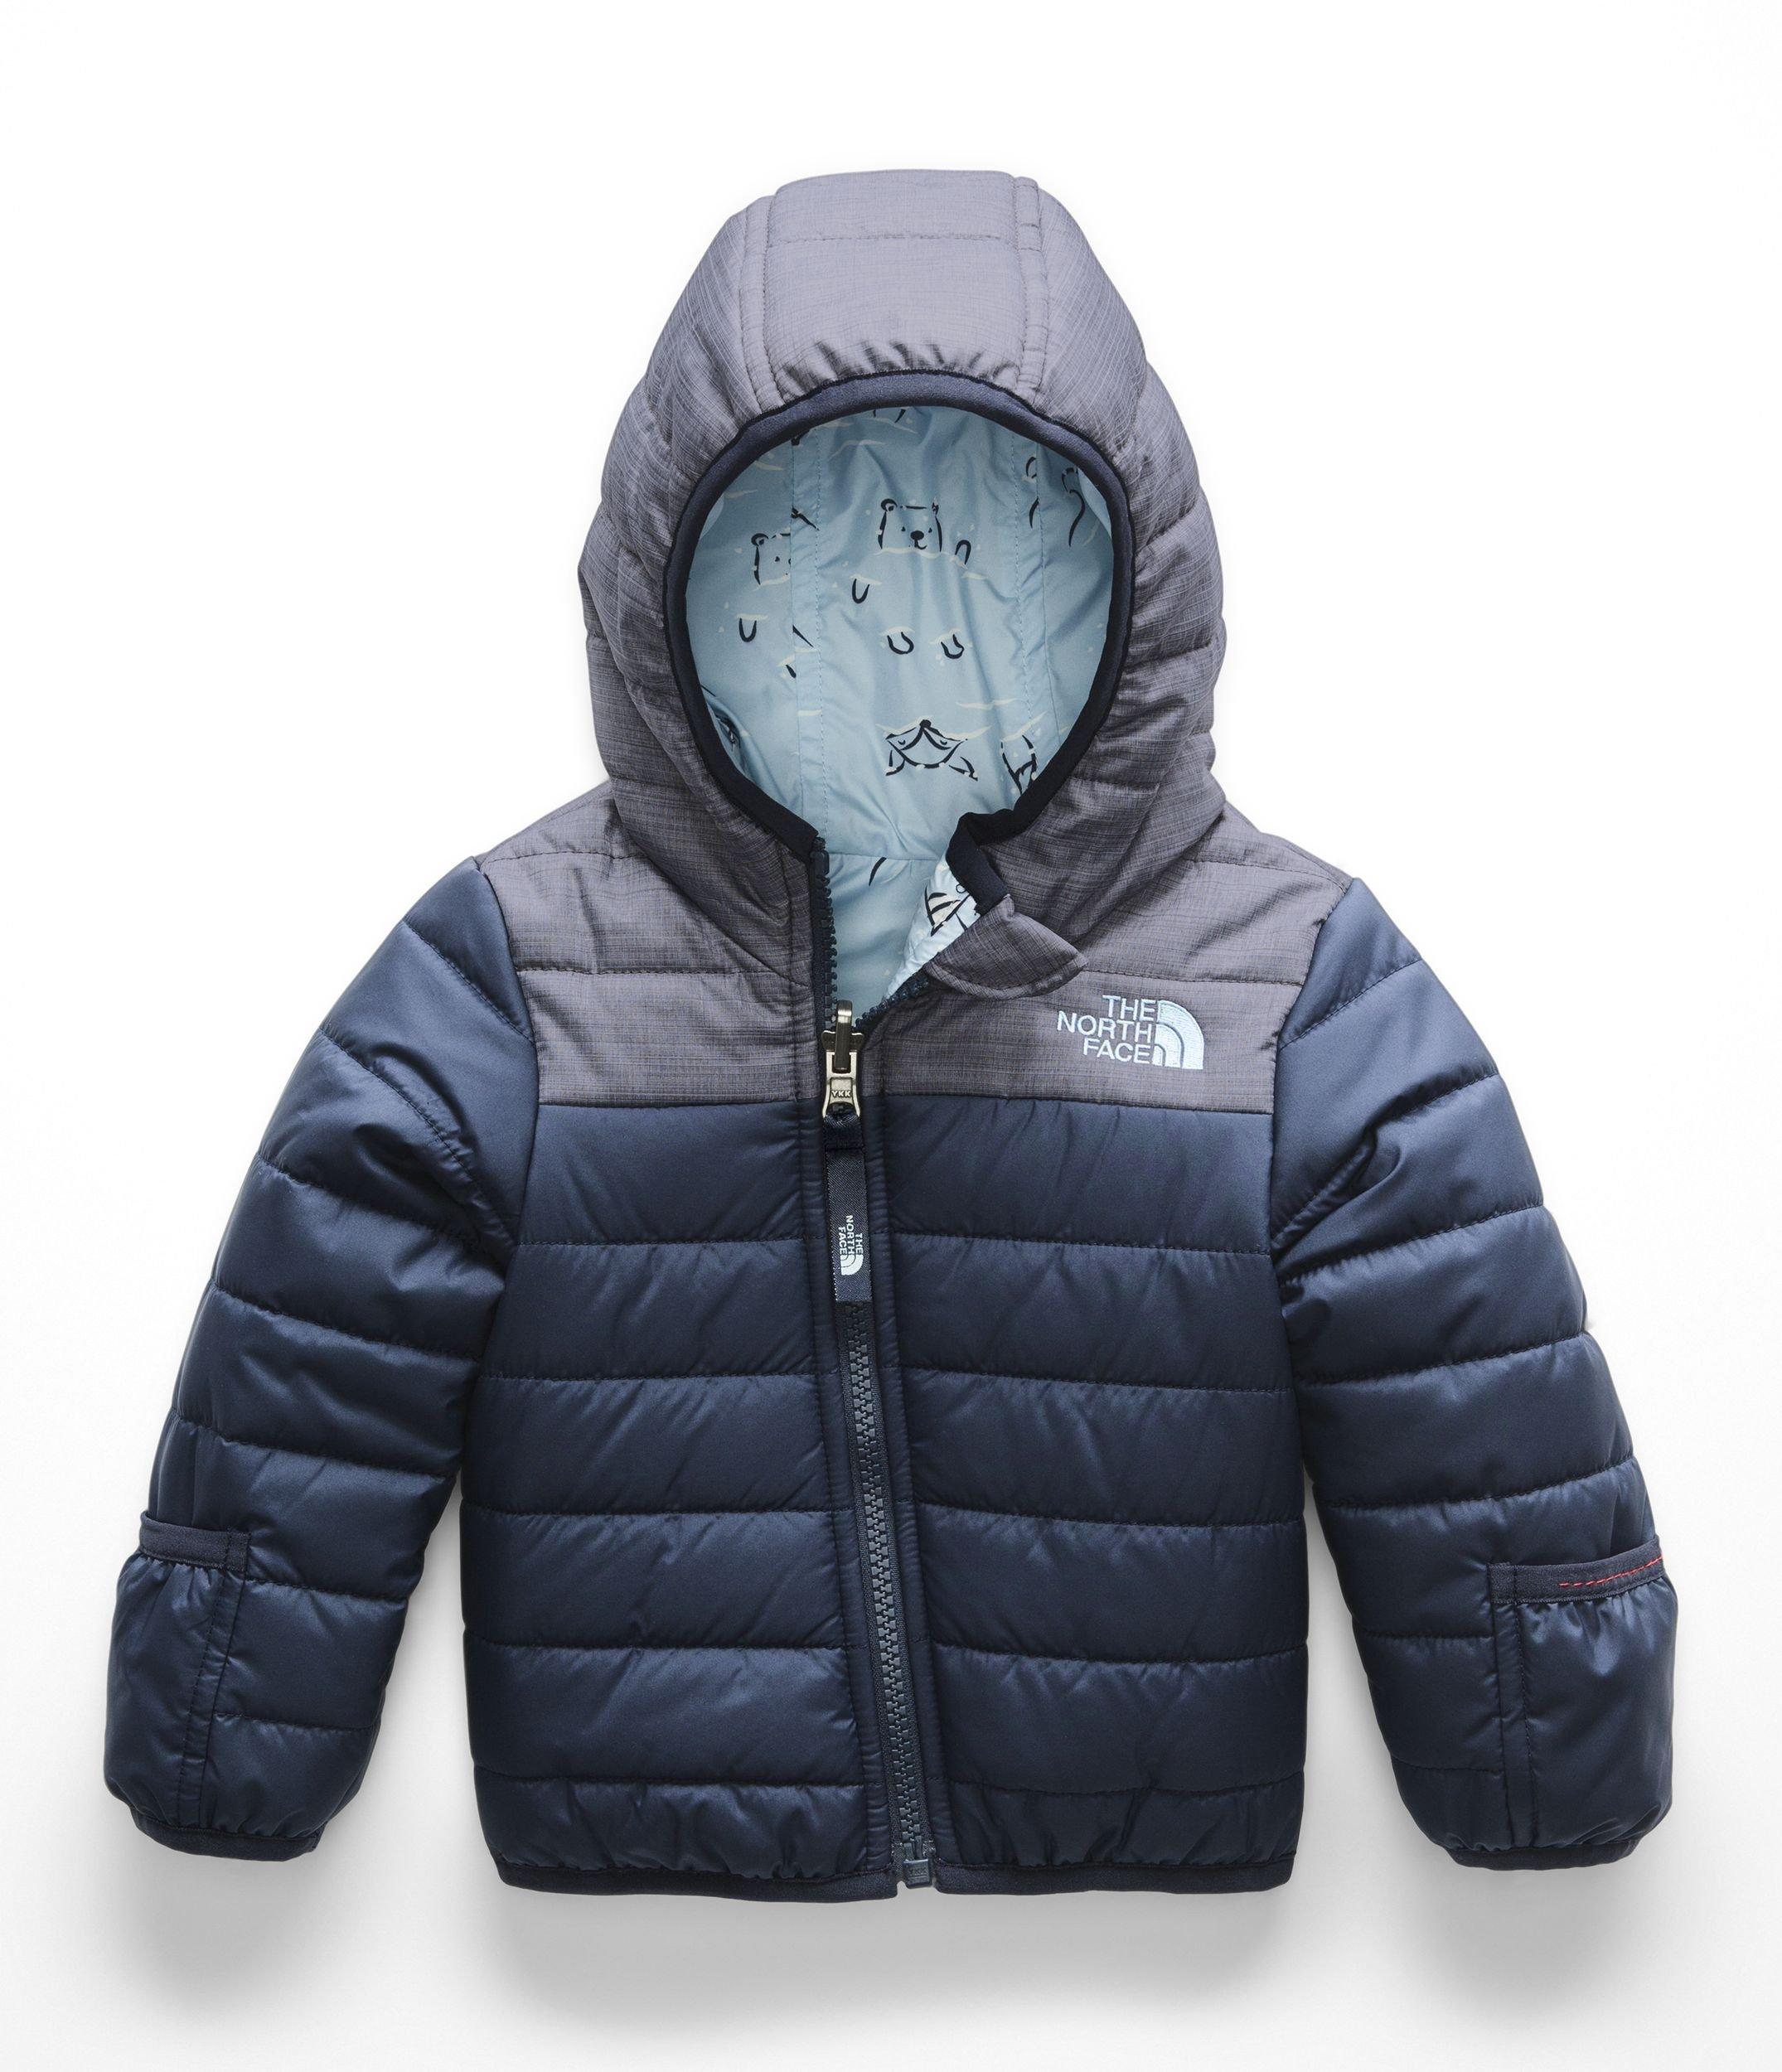 2d2a26dfa4f1 Best Rated in Baby Boys  Rain Wear   Helpful Customer Reviews ...